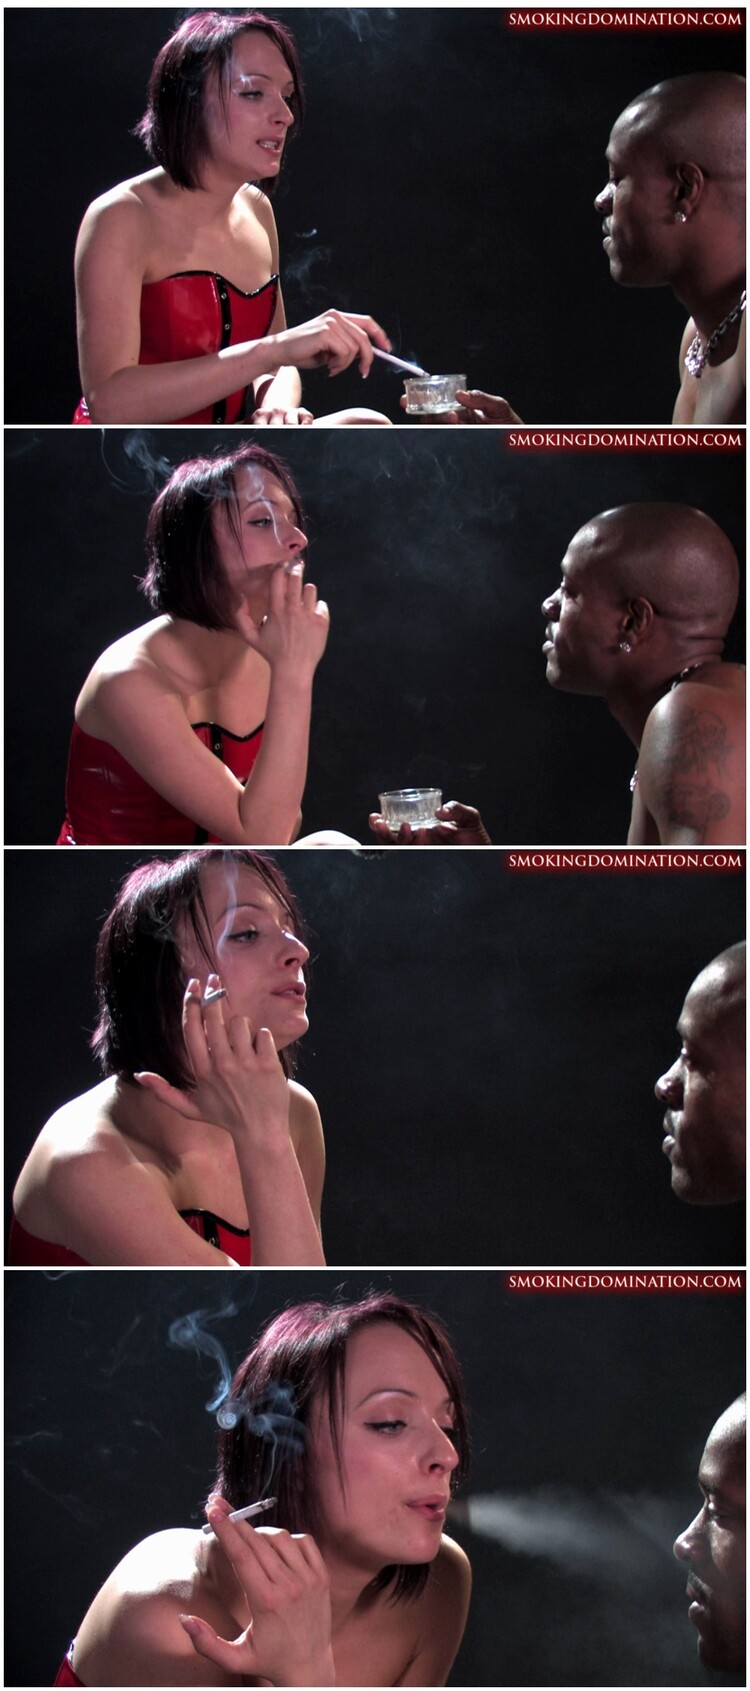 smoking071_cover_l.jpg